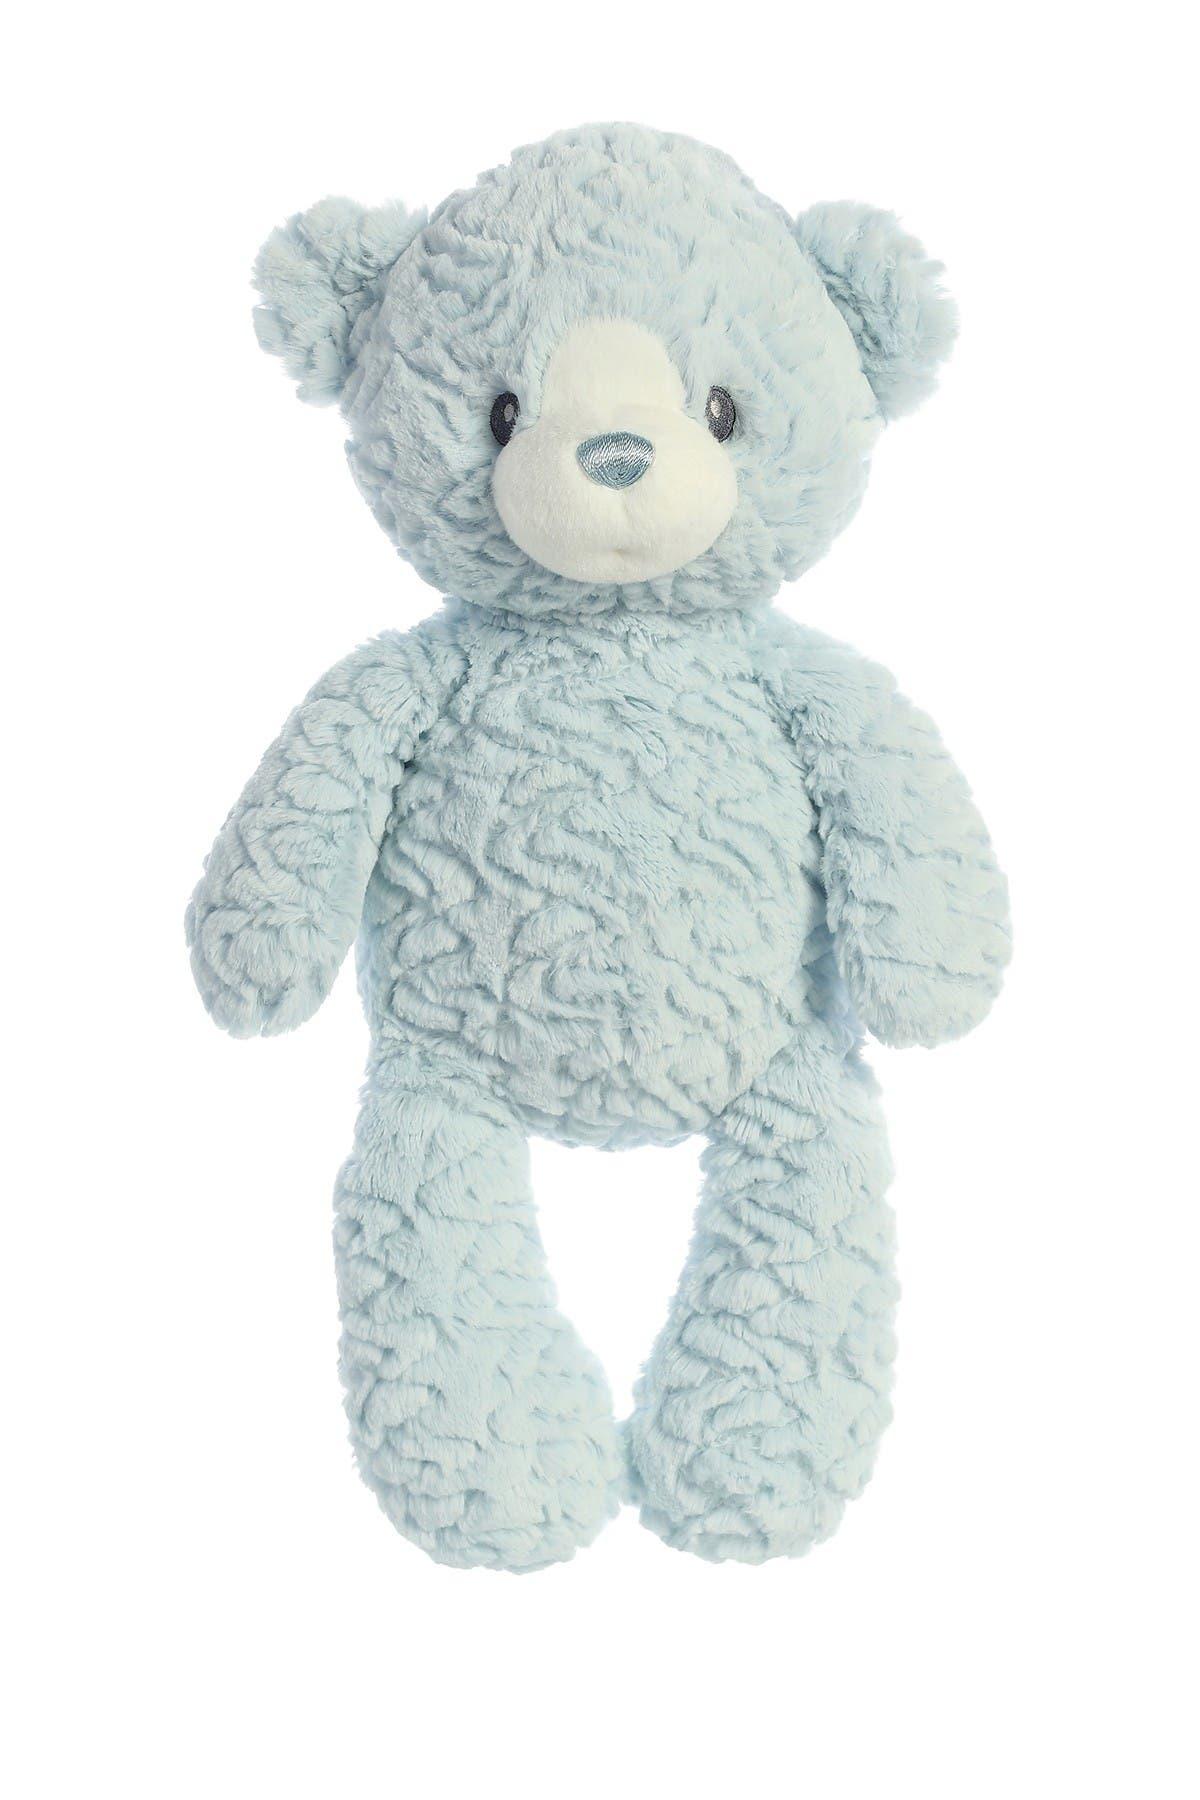 Image of Aurora World Toys Huggy Bear